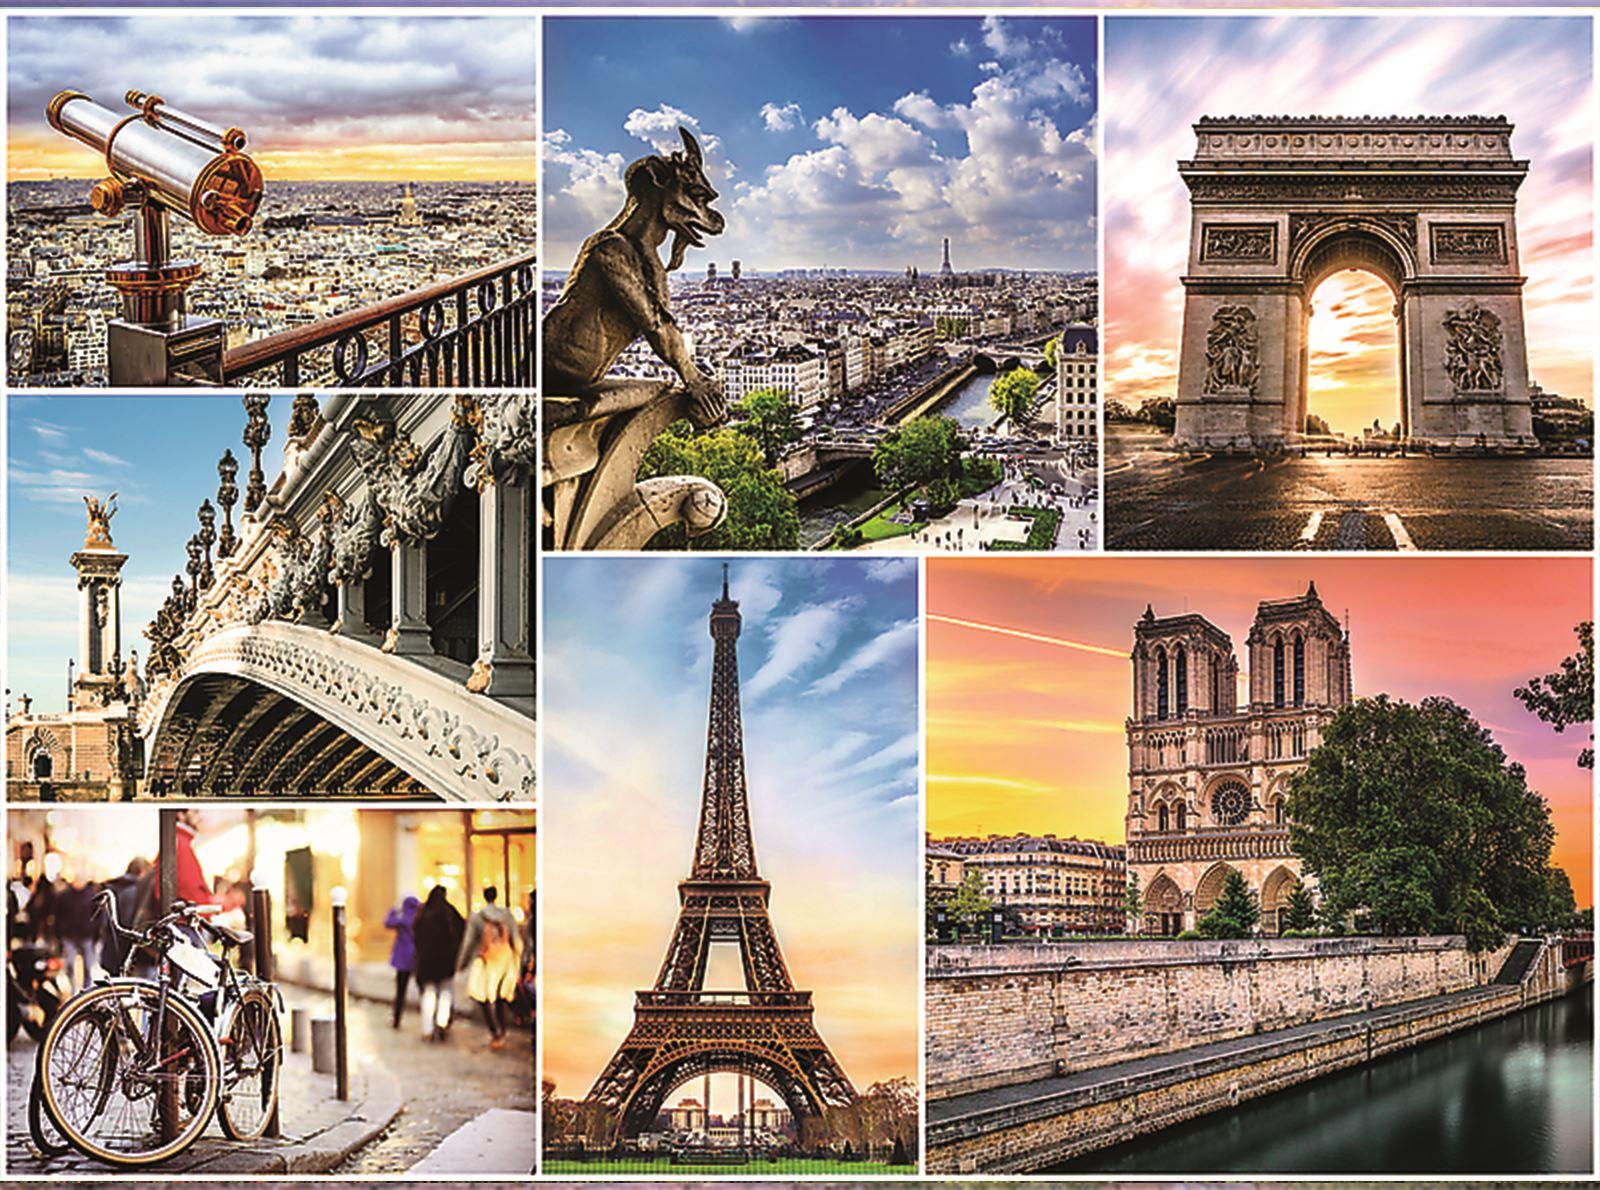 Trefl-300-500-1000-1500-2000-3000-4000-6000-Piece-Jigsaw-Puzzle-Landscapes-City thumbnail 207